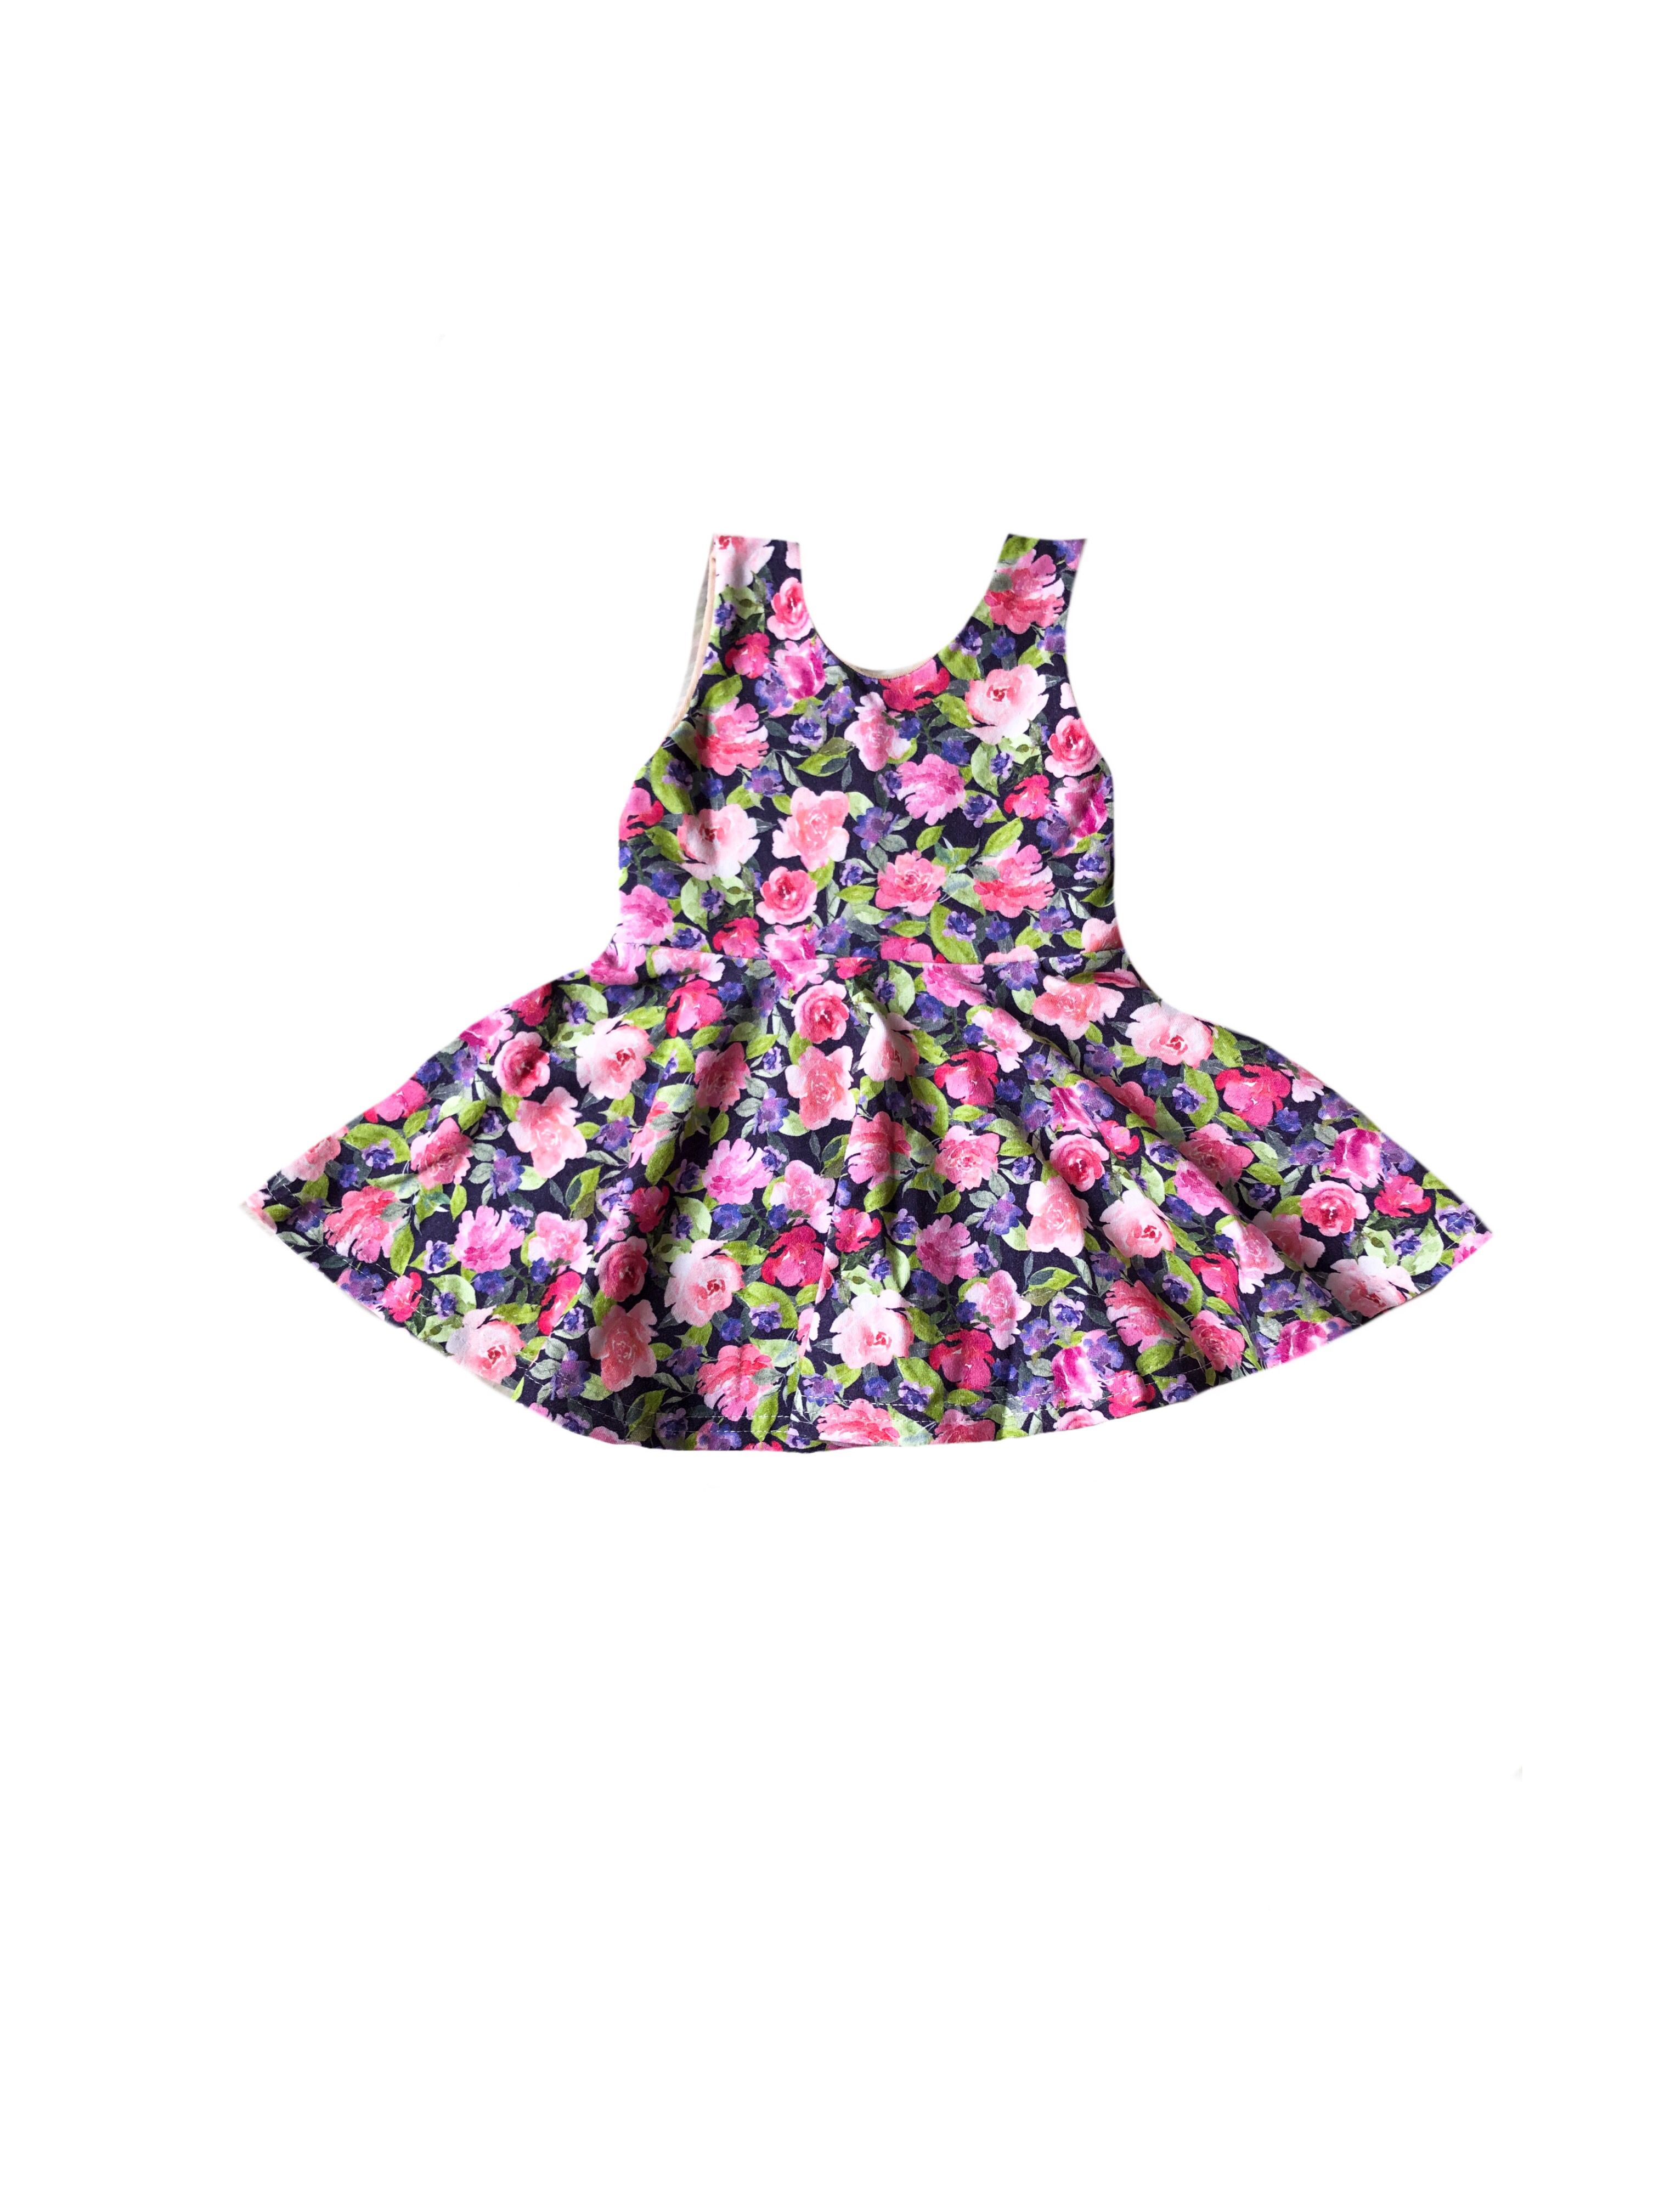 e850ad58b3efd Pink Floral Scoop Back Tank Top Peplum - Girls Spring Navy Purple ...